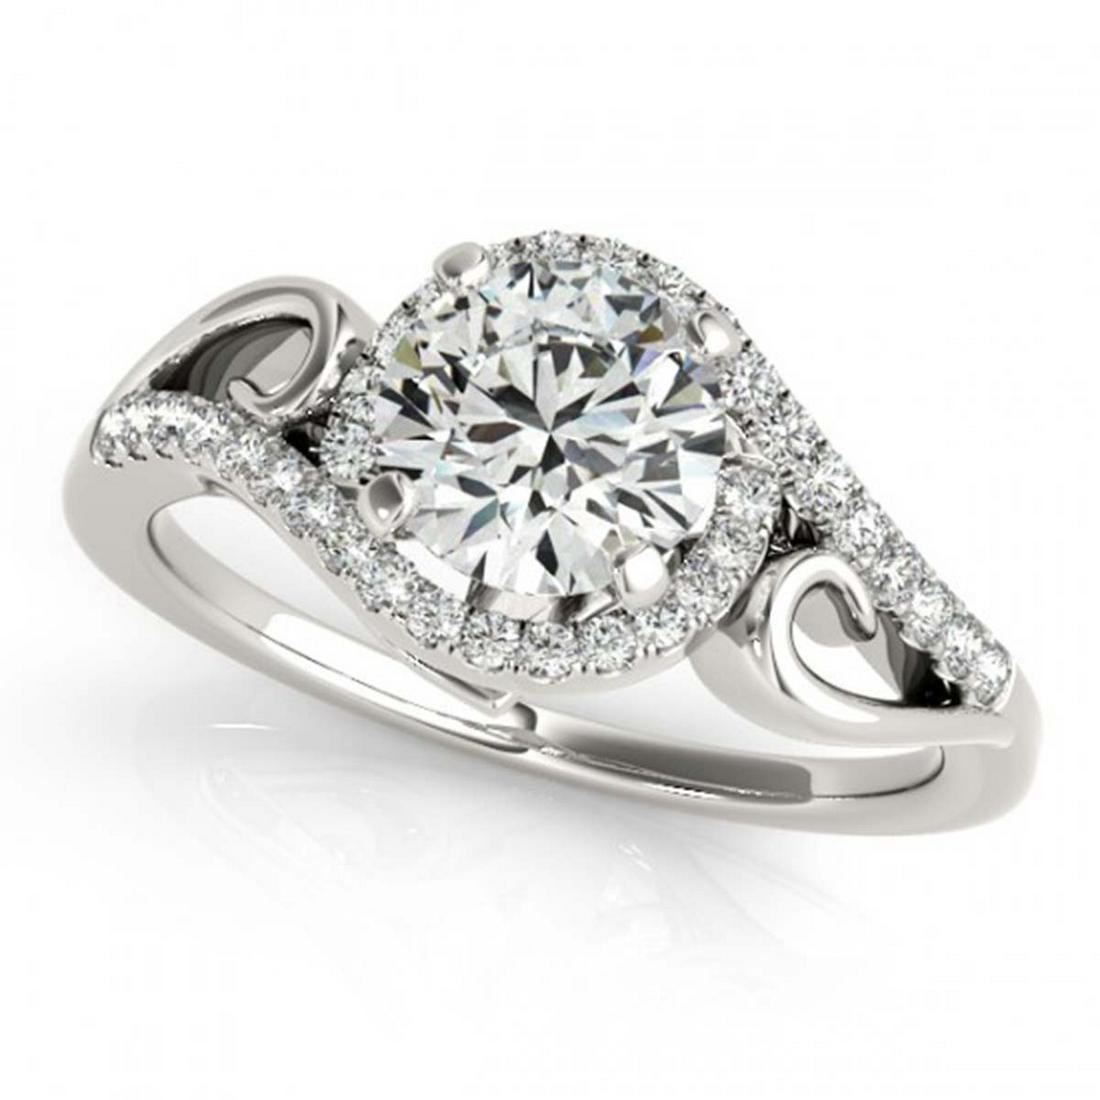 0.75 ctw VS/SI Diamond Solitaire Halo Ring 18K White